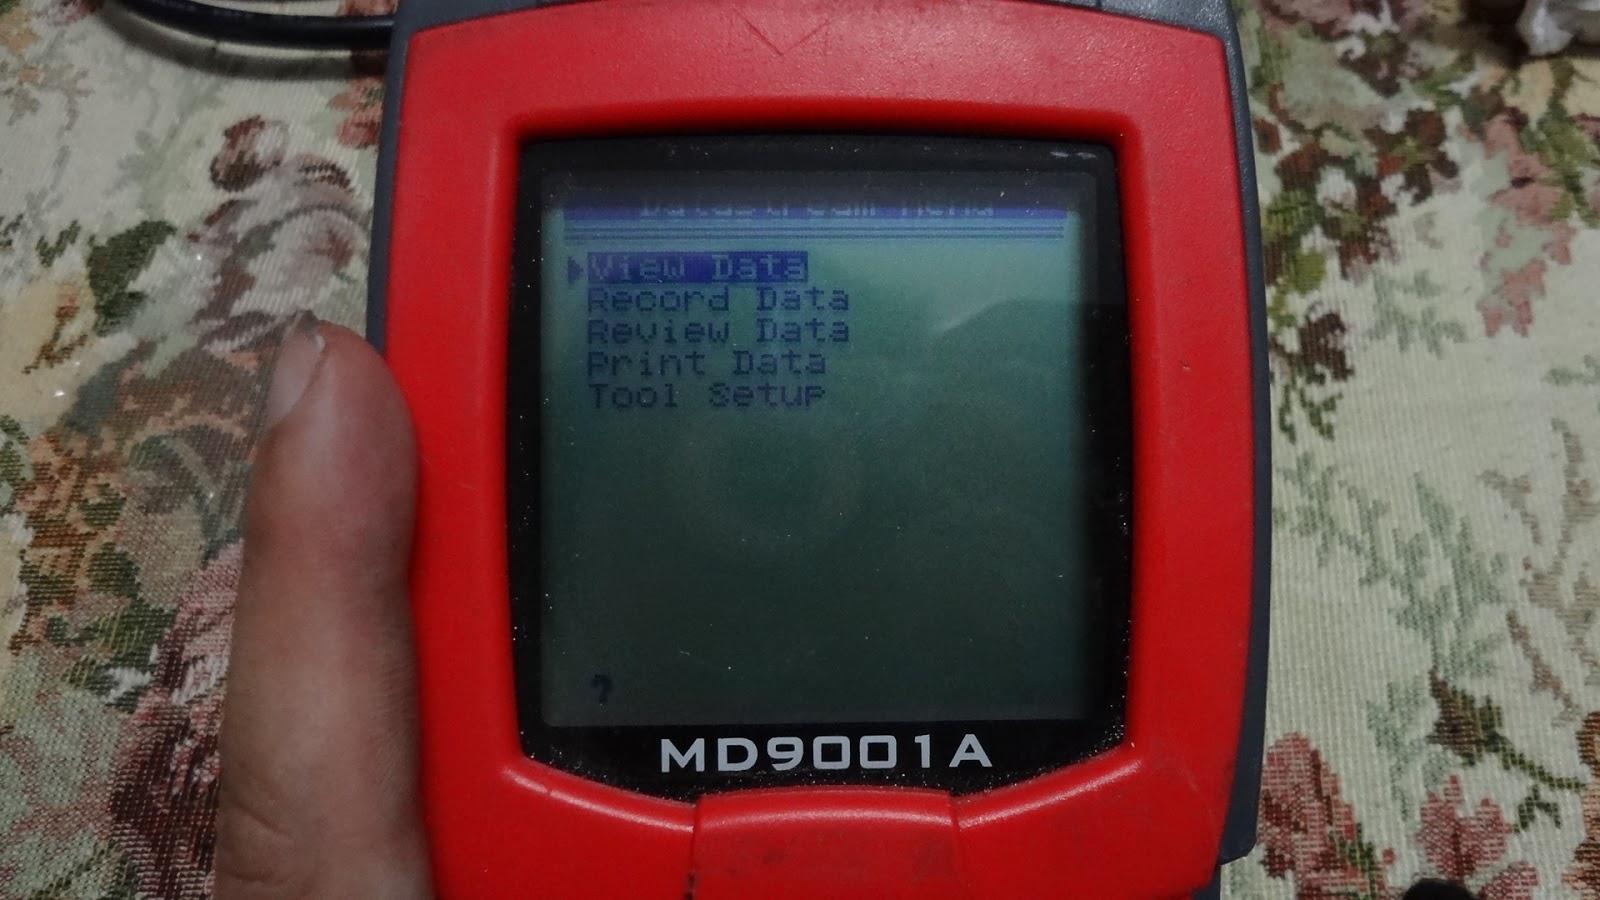 Bob electronics: MATCO TOOLS MD9001A AUTO CODE SCANNER